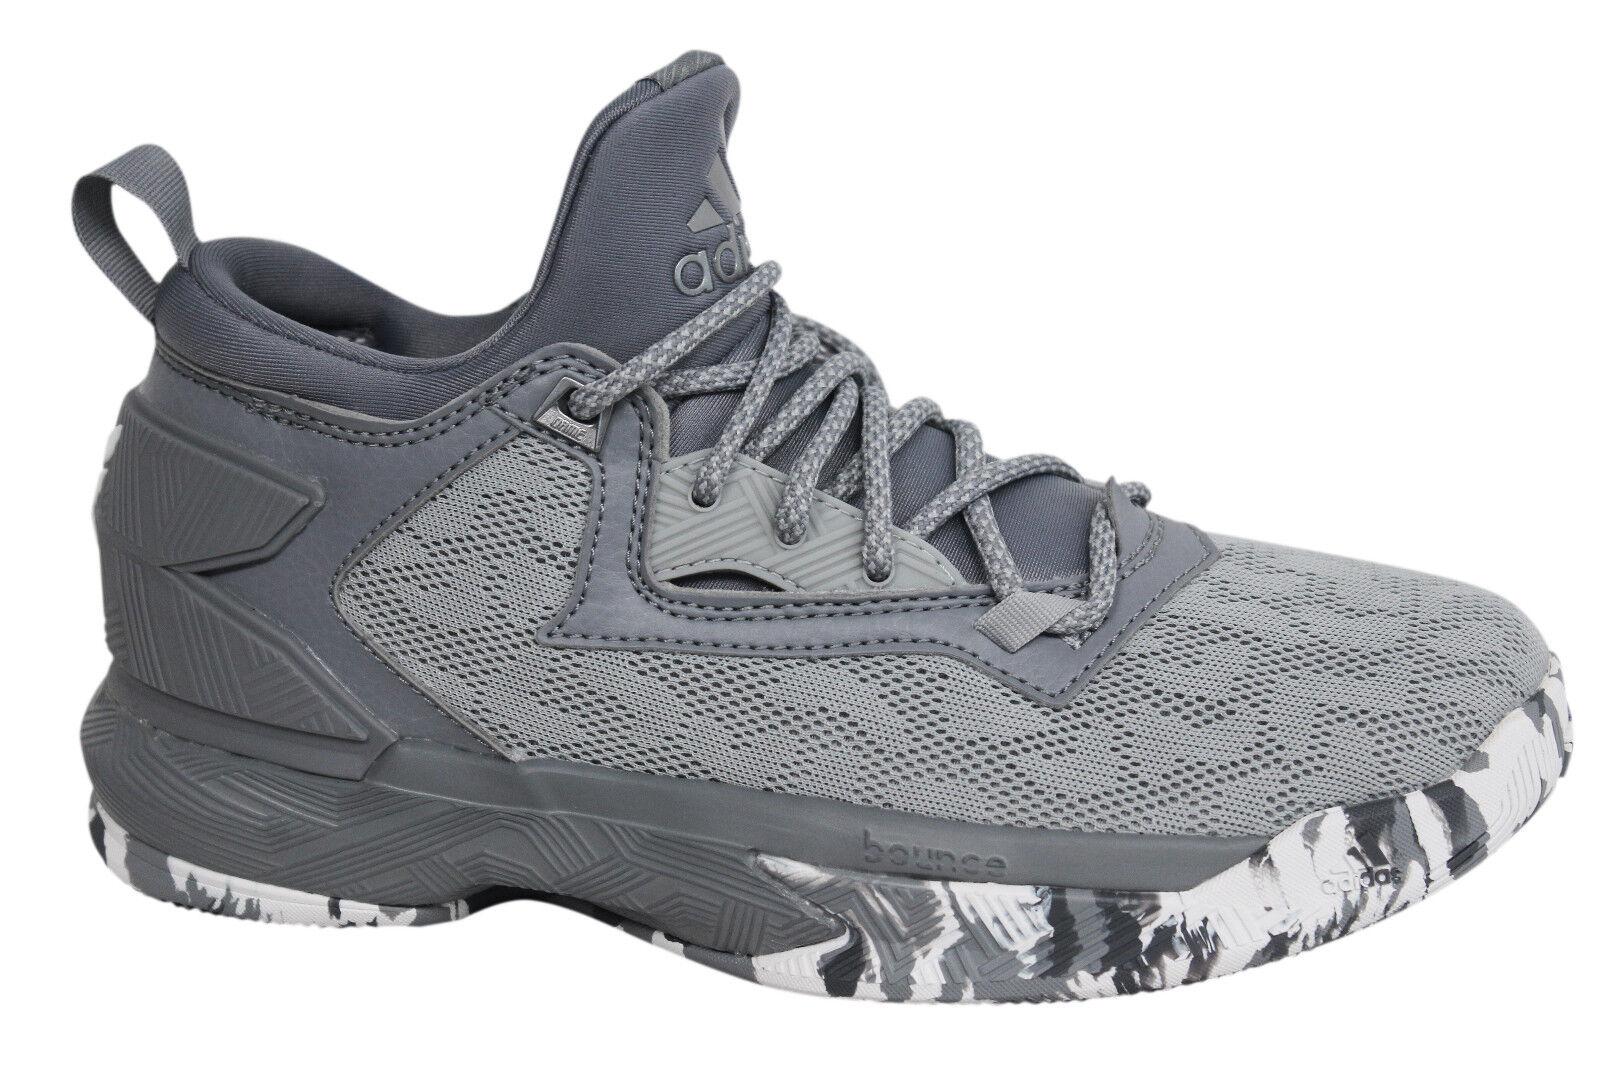 Adidas D Lillard 2 Lace Up GRIS hombre  Basketball formadores b42381 u84